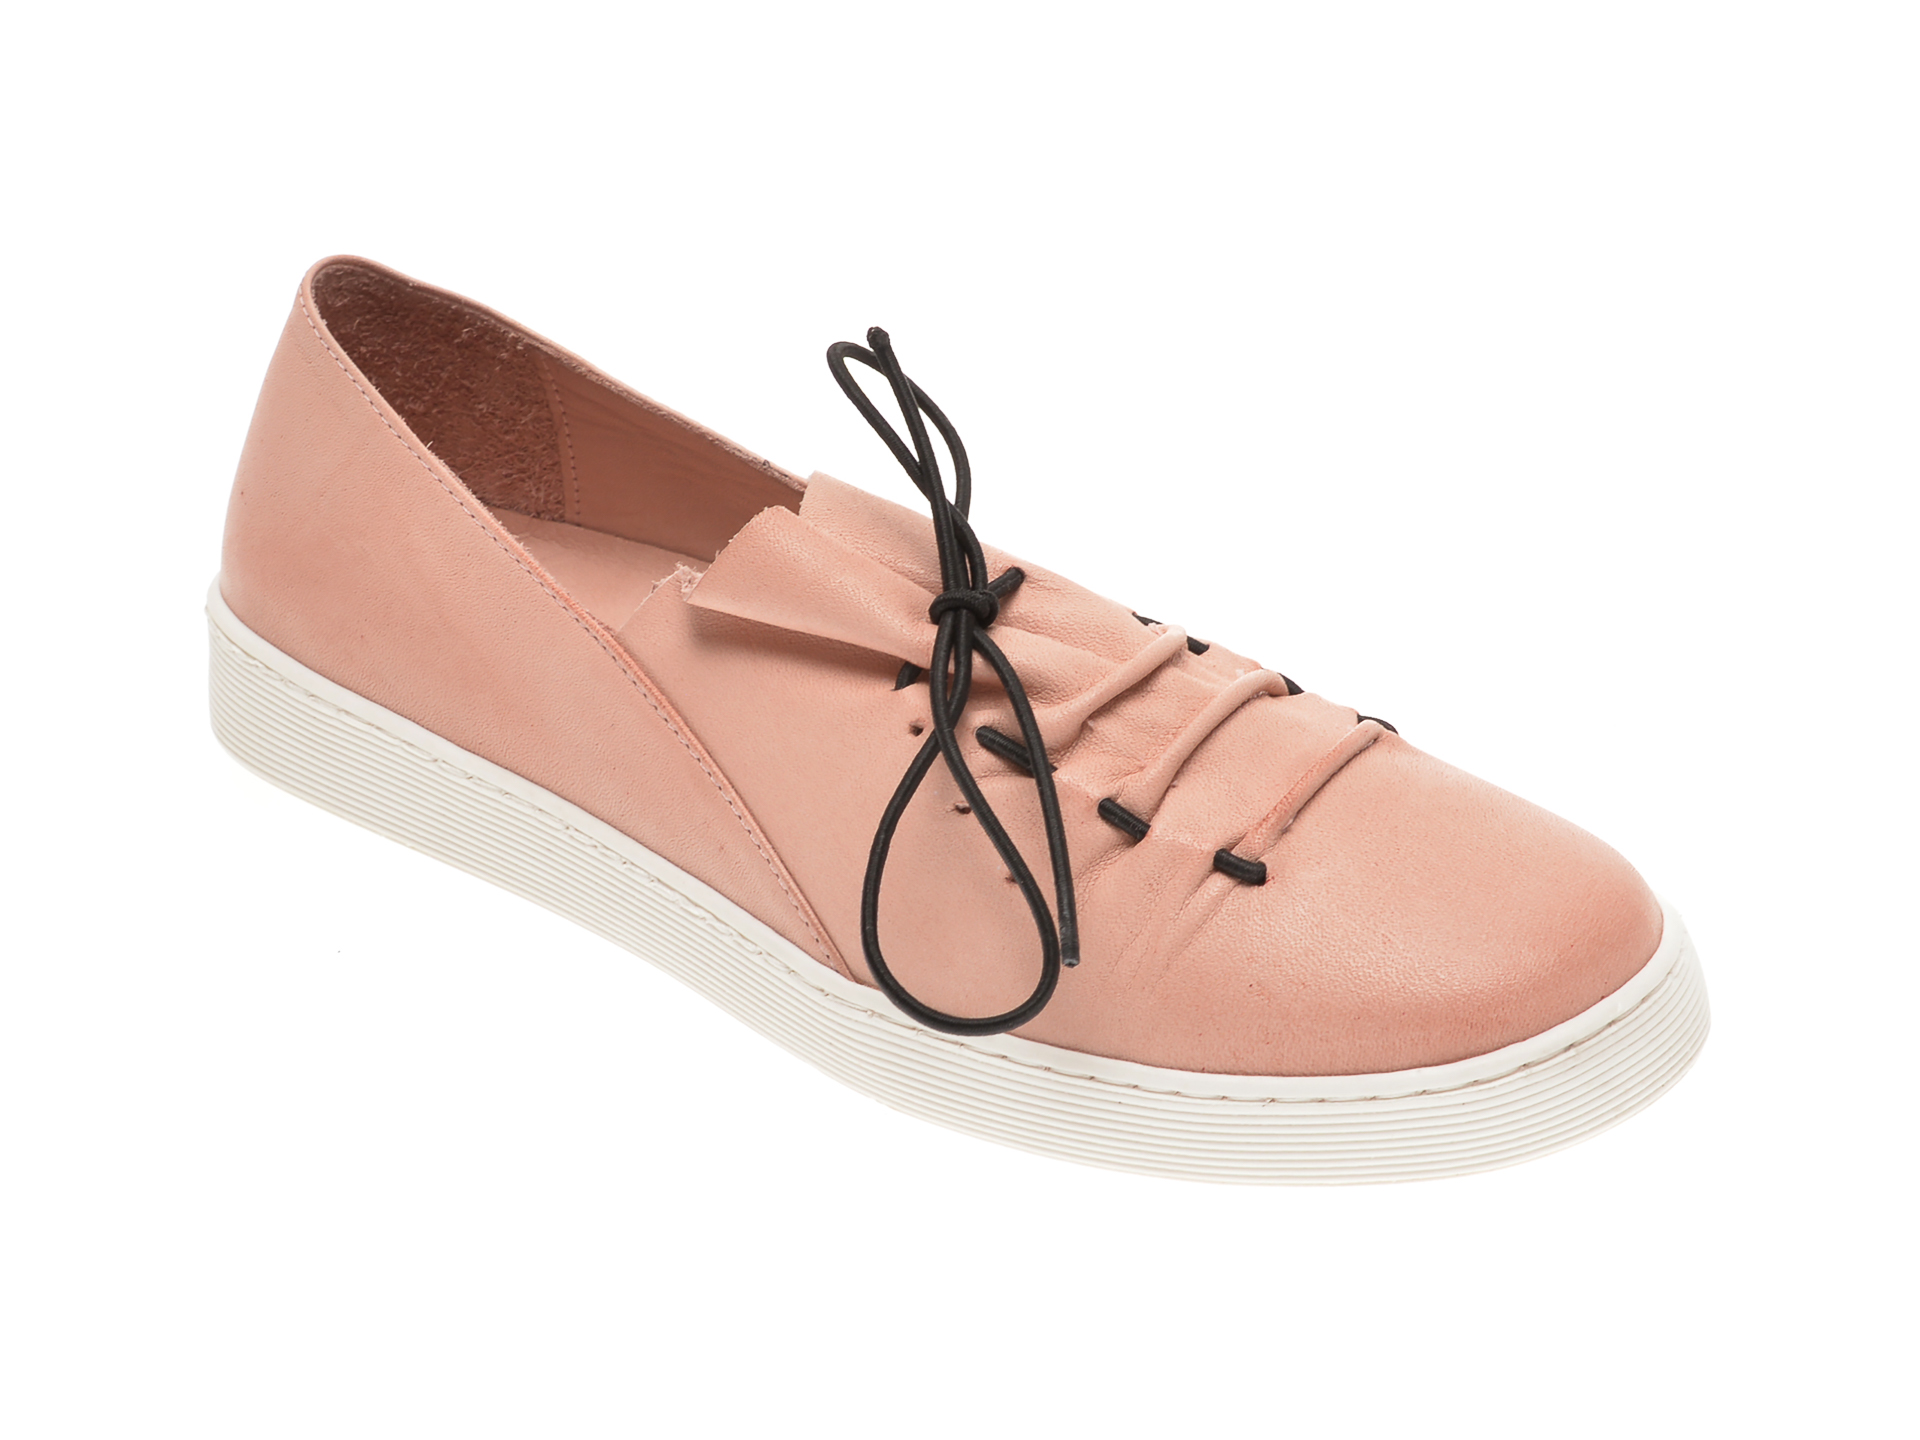 Pantofi BABOOS roz, R09, din piele naturala imagine